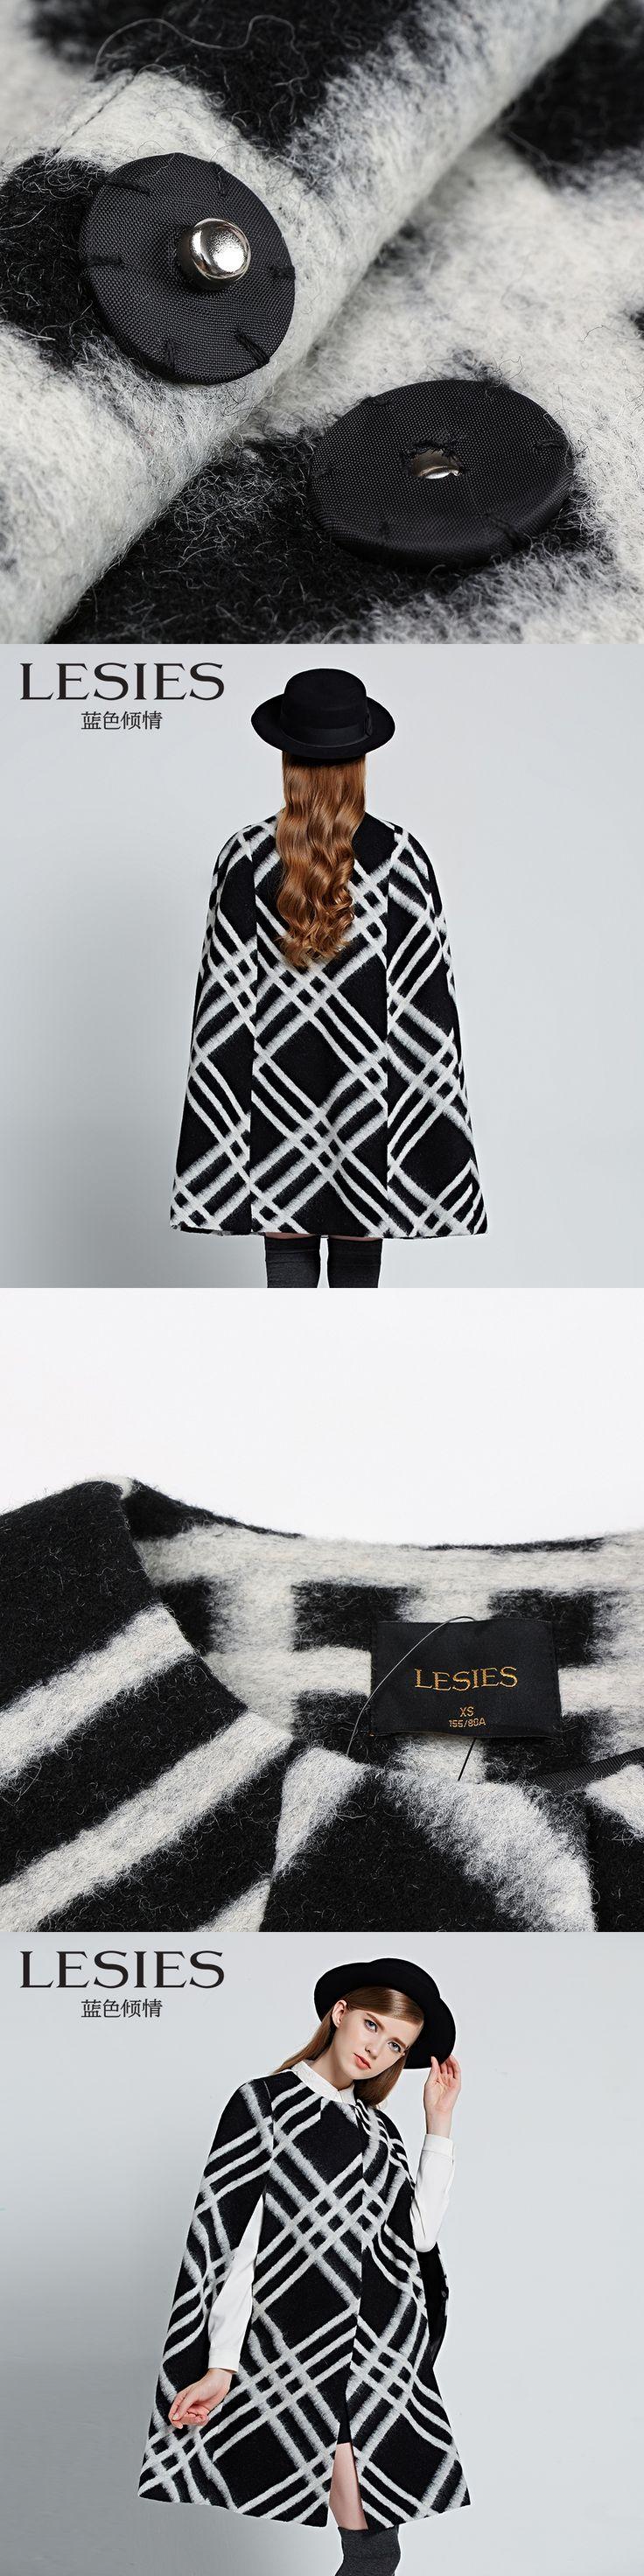 LESIES Brand Women Winter Clothes Fashion Geometric Plaid Short Sleeve Woolen Mantle Coats Lady Parkas Outwear Overcoat LS158406